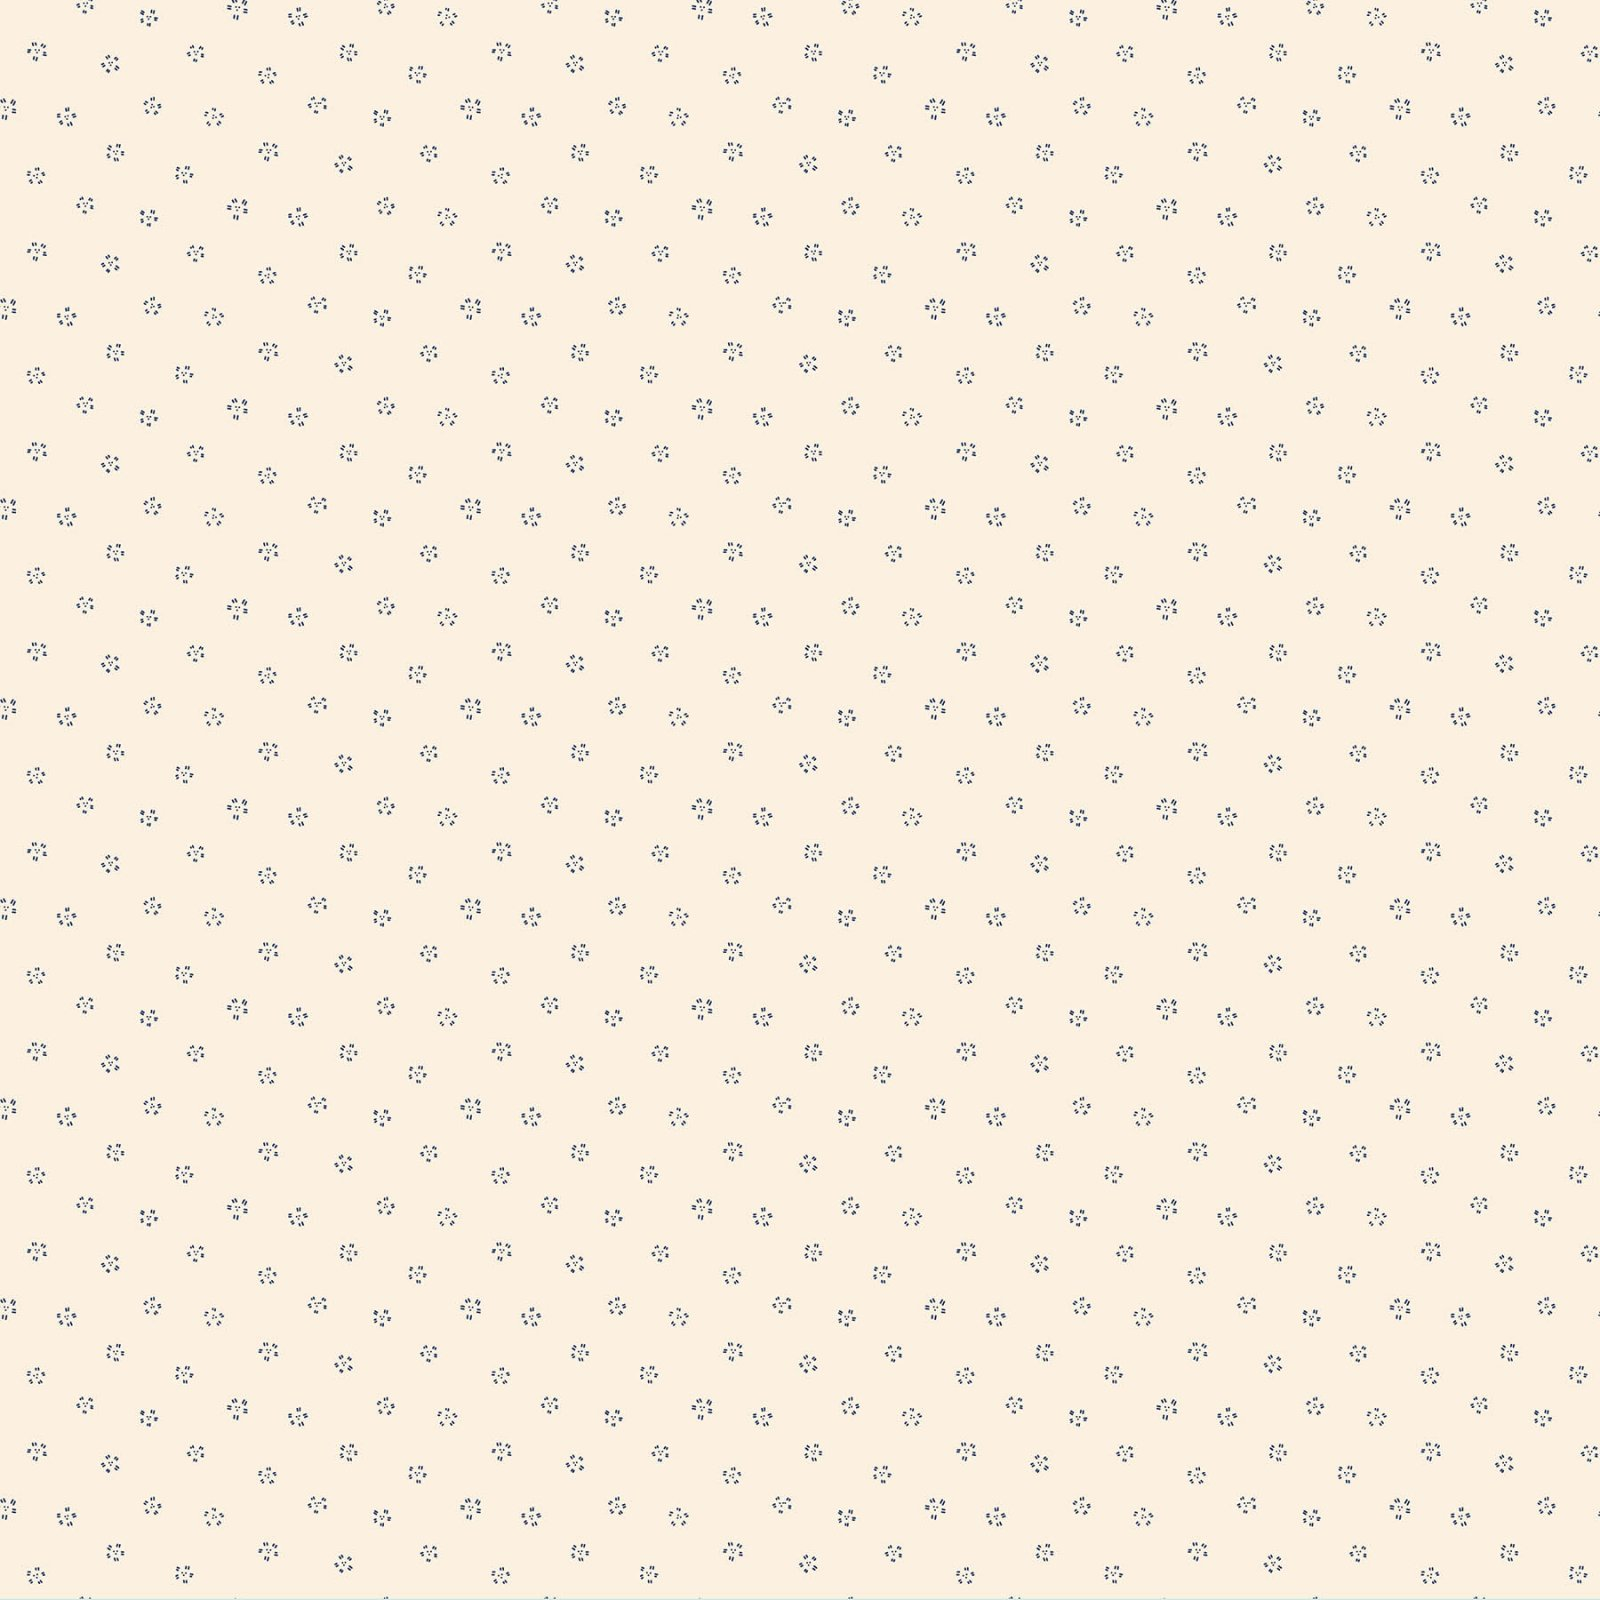 Kingyo by Lemonni for Figo - Sakura in Cream